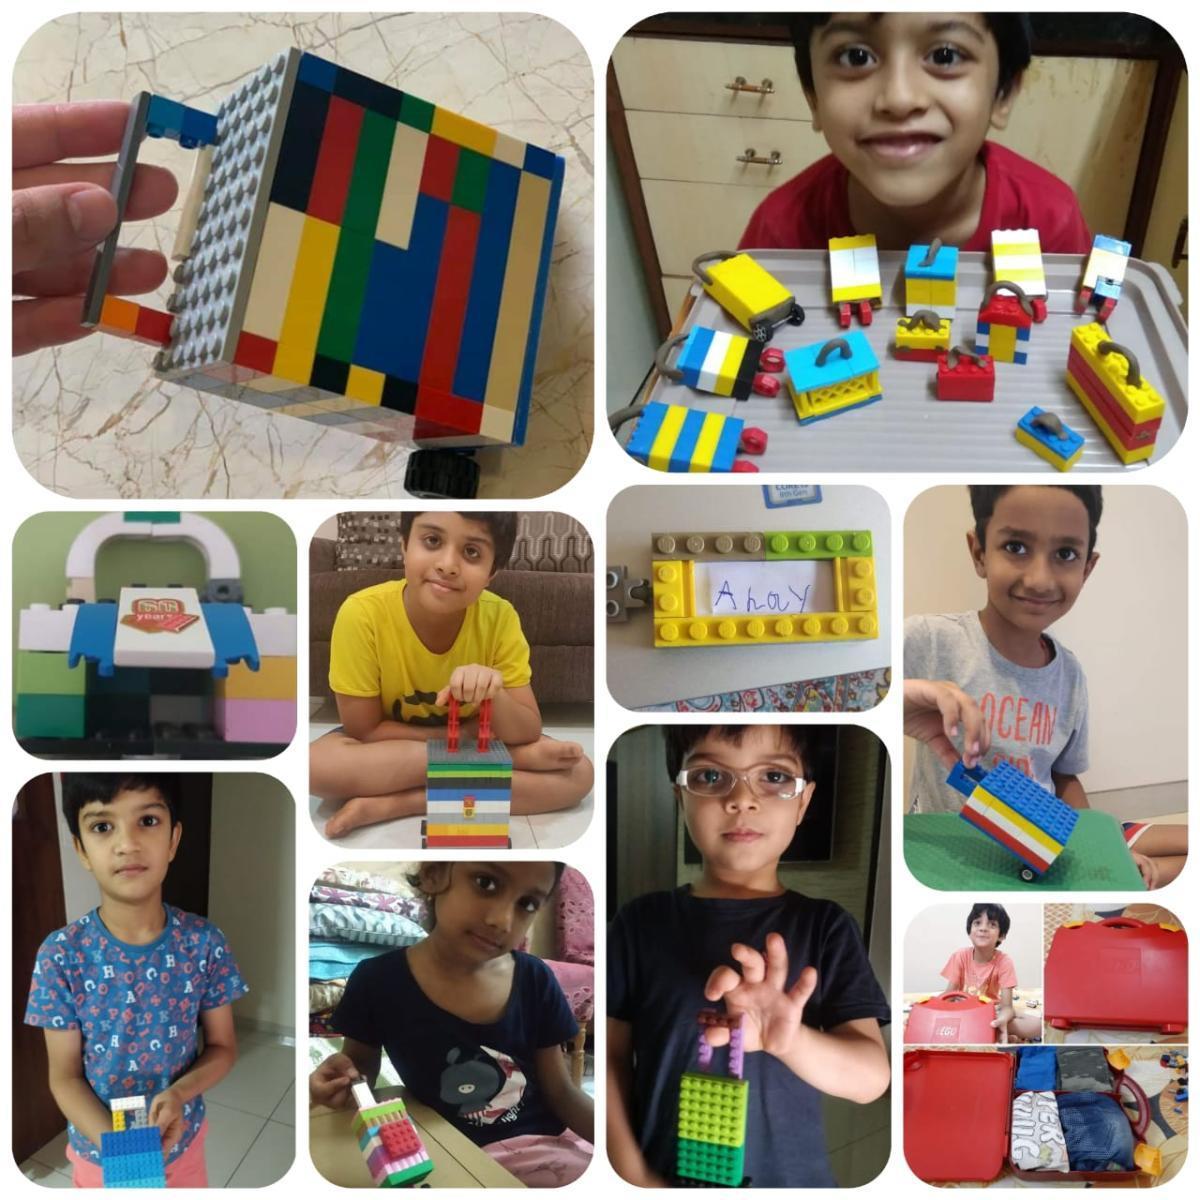 lego-mumbai (1) (1) (1) (1) (1) (1)